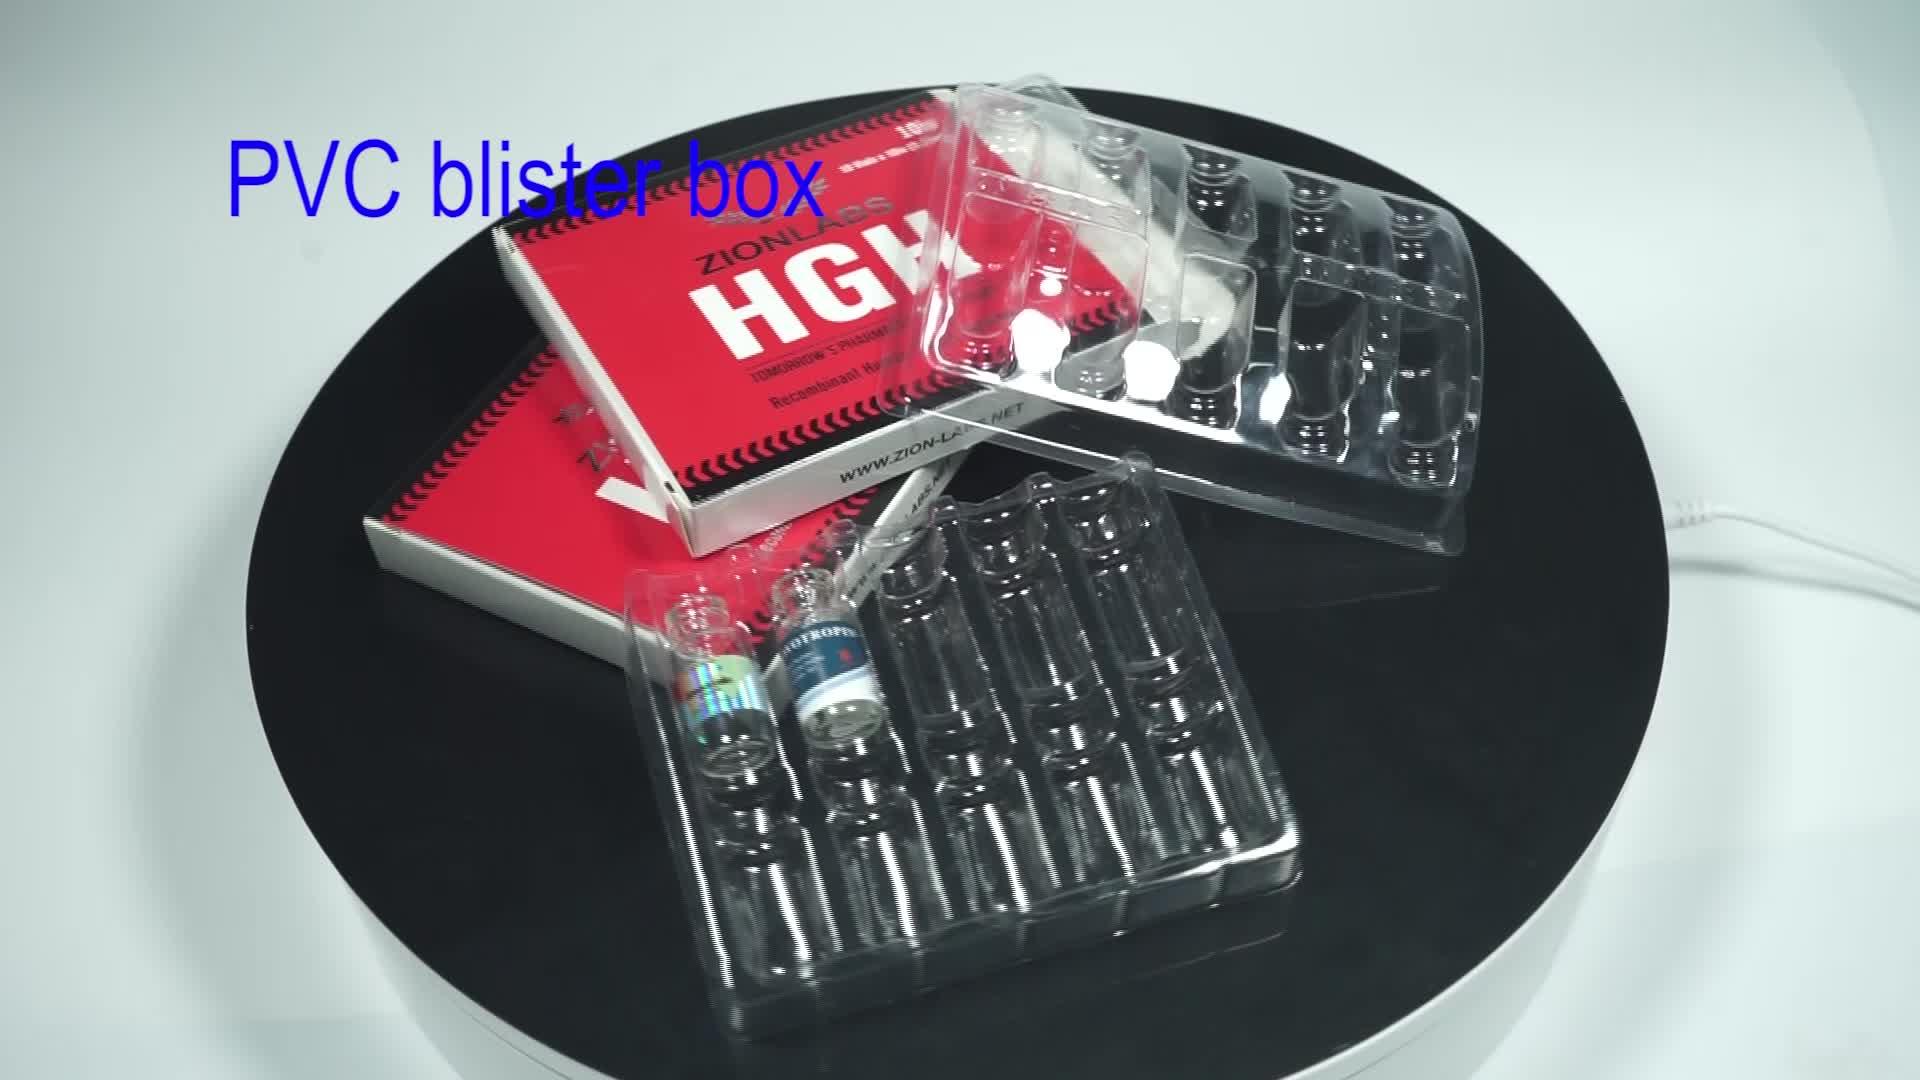 कस्टम चिकित्सा गोली बोतल कागज बॉक्स पैकेजिंग